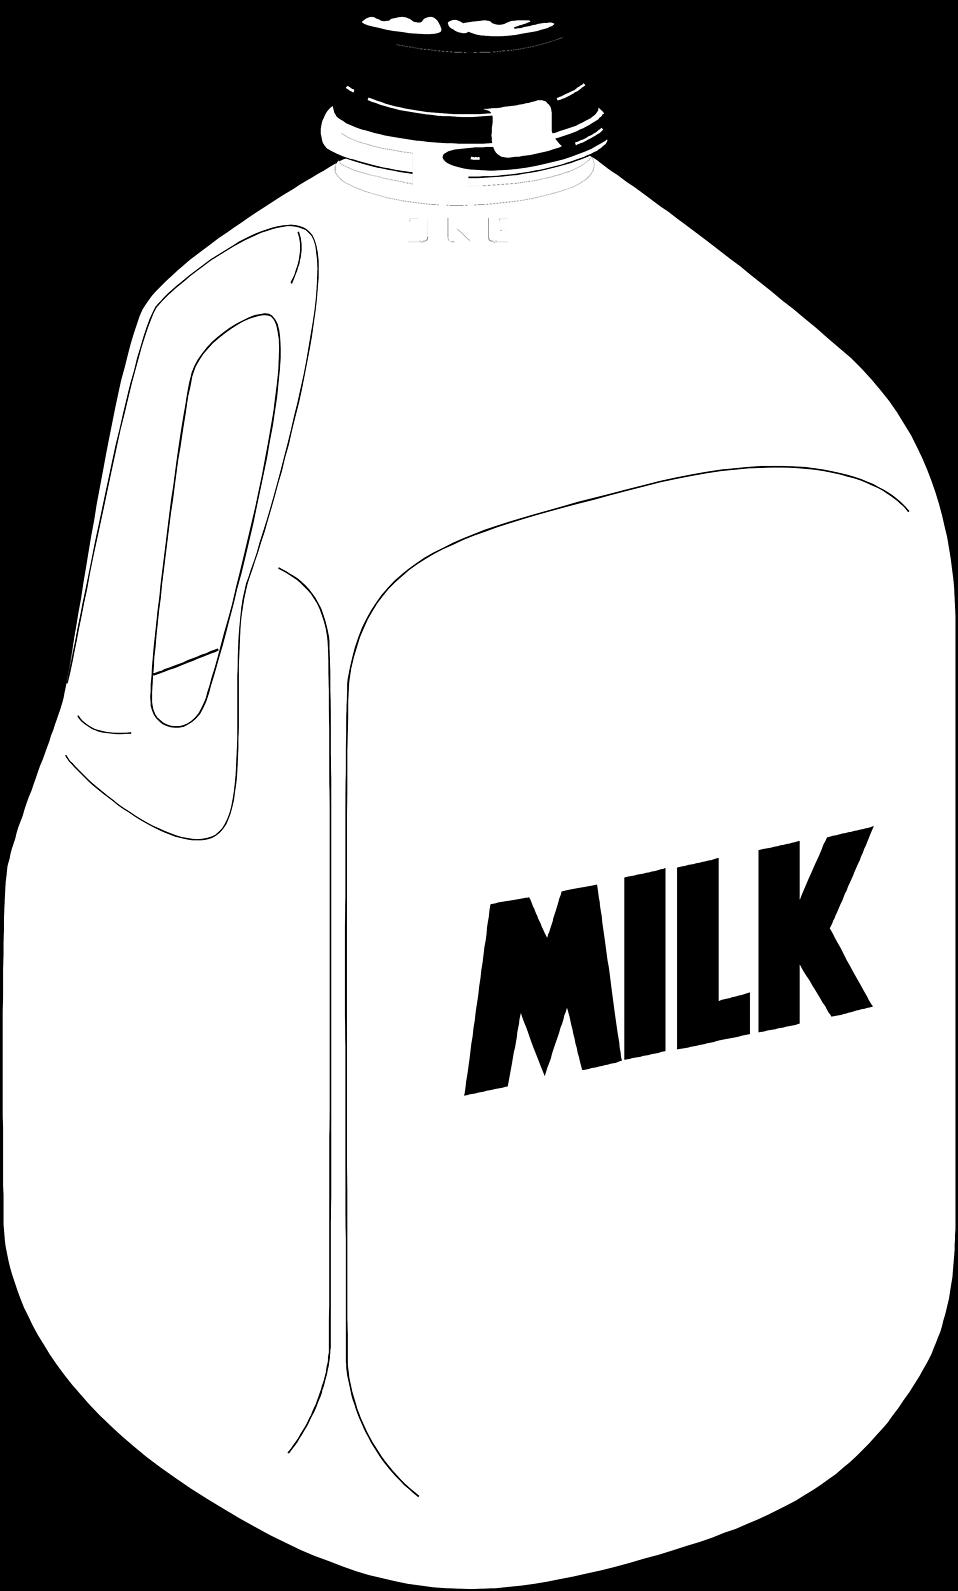 Milk Carton clipart pint milk Kid Cliparting milk kid Pint